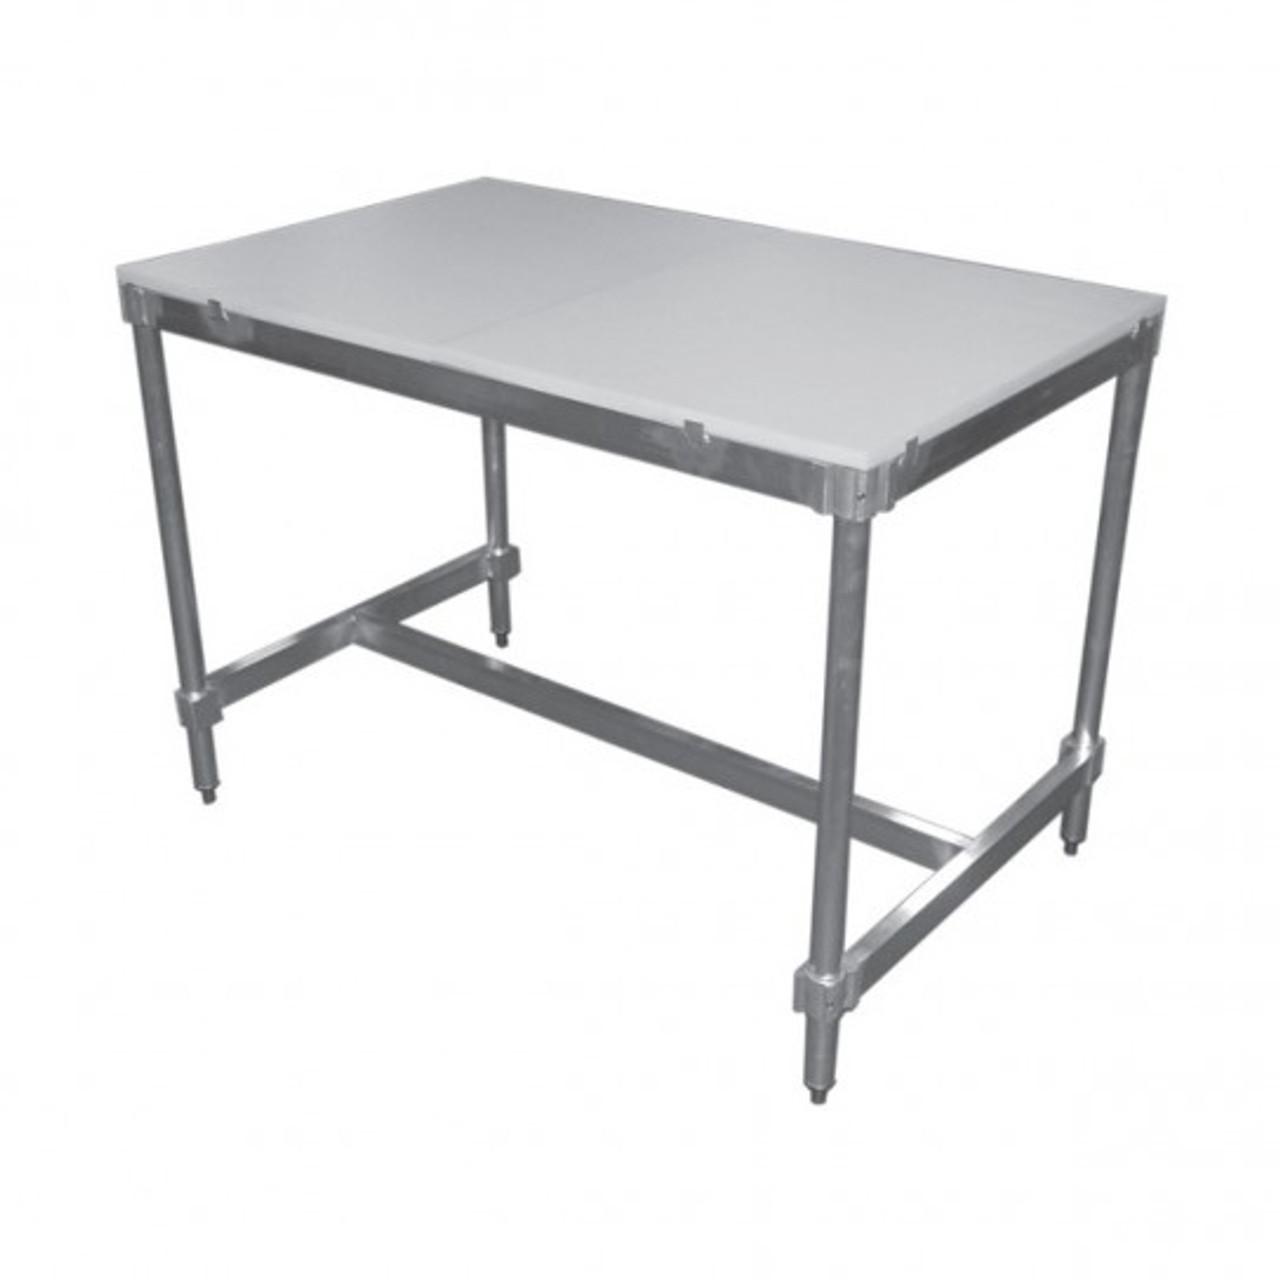 "Poly Top Tables without Backsplash Item length 48"""